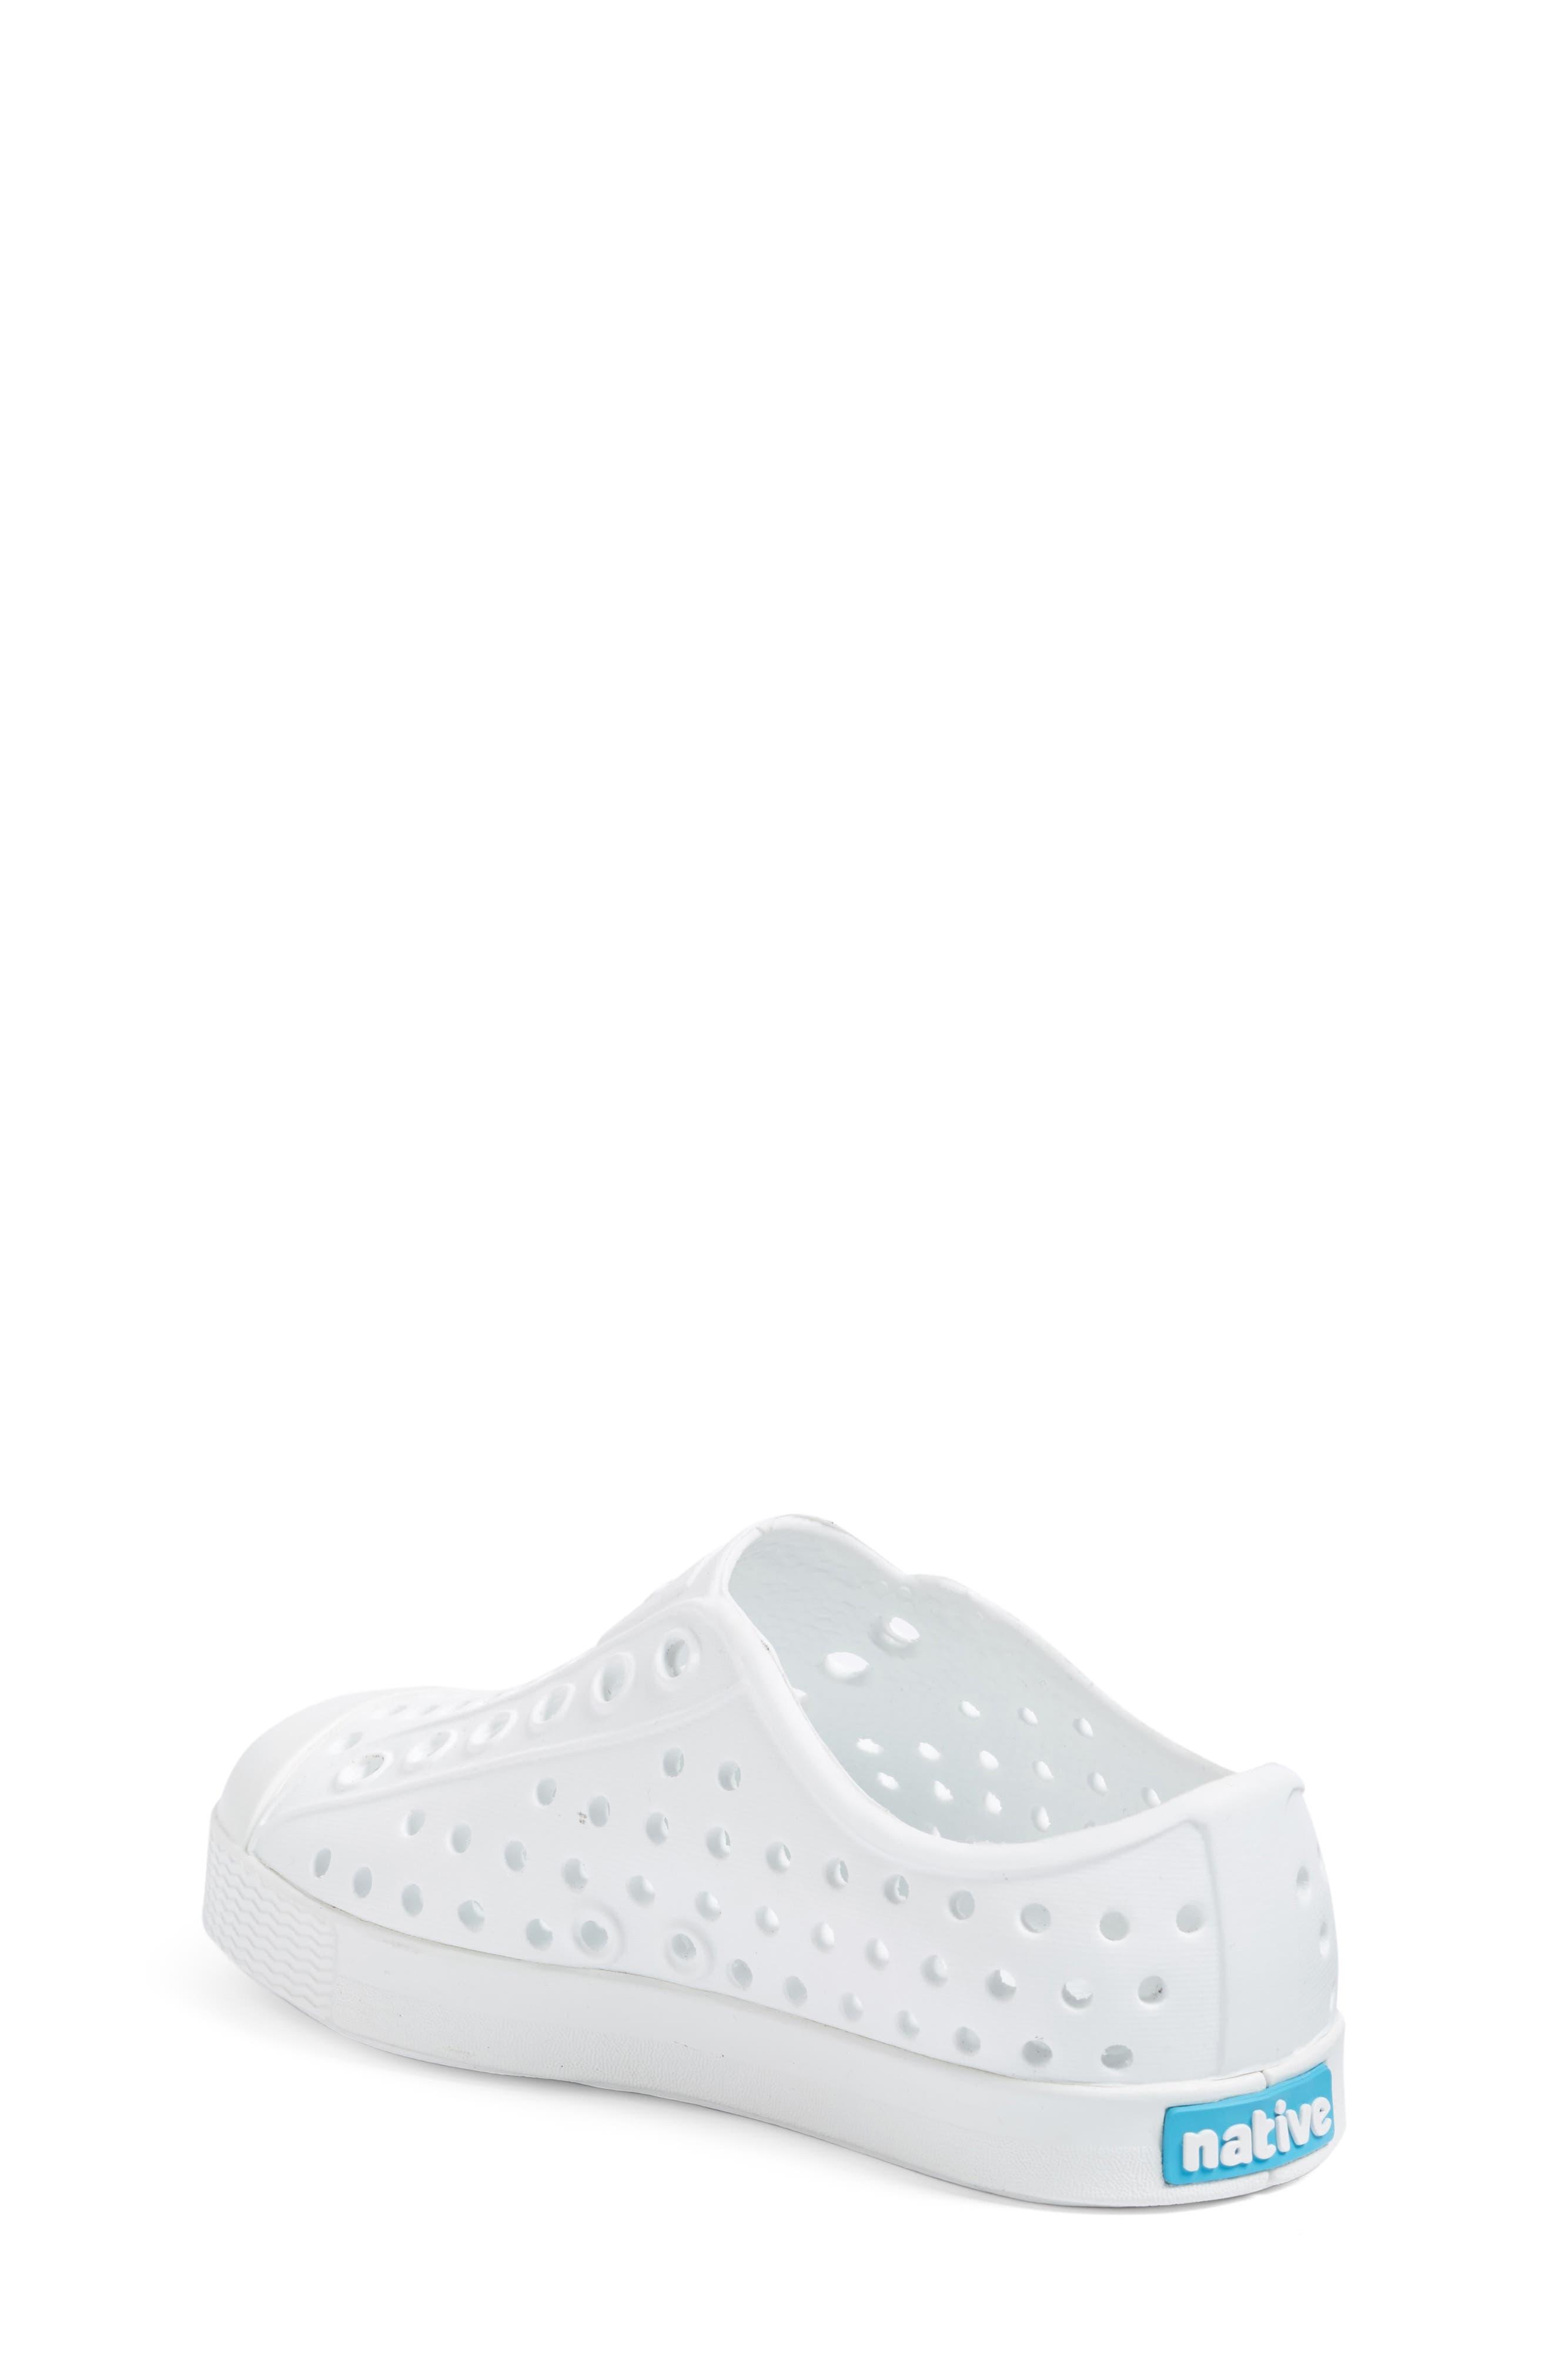 Alternate Image 2  - Native Shoes 'Jefferson' Slip-On Sneaker (Baby, Walker, Toddler, Little Kid & Big Kid)